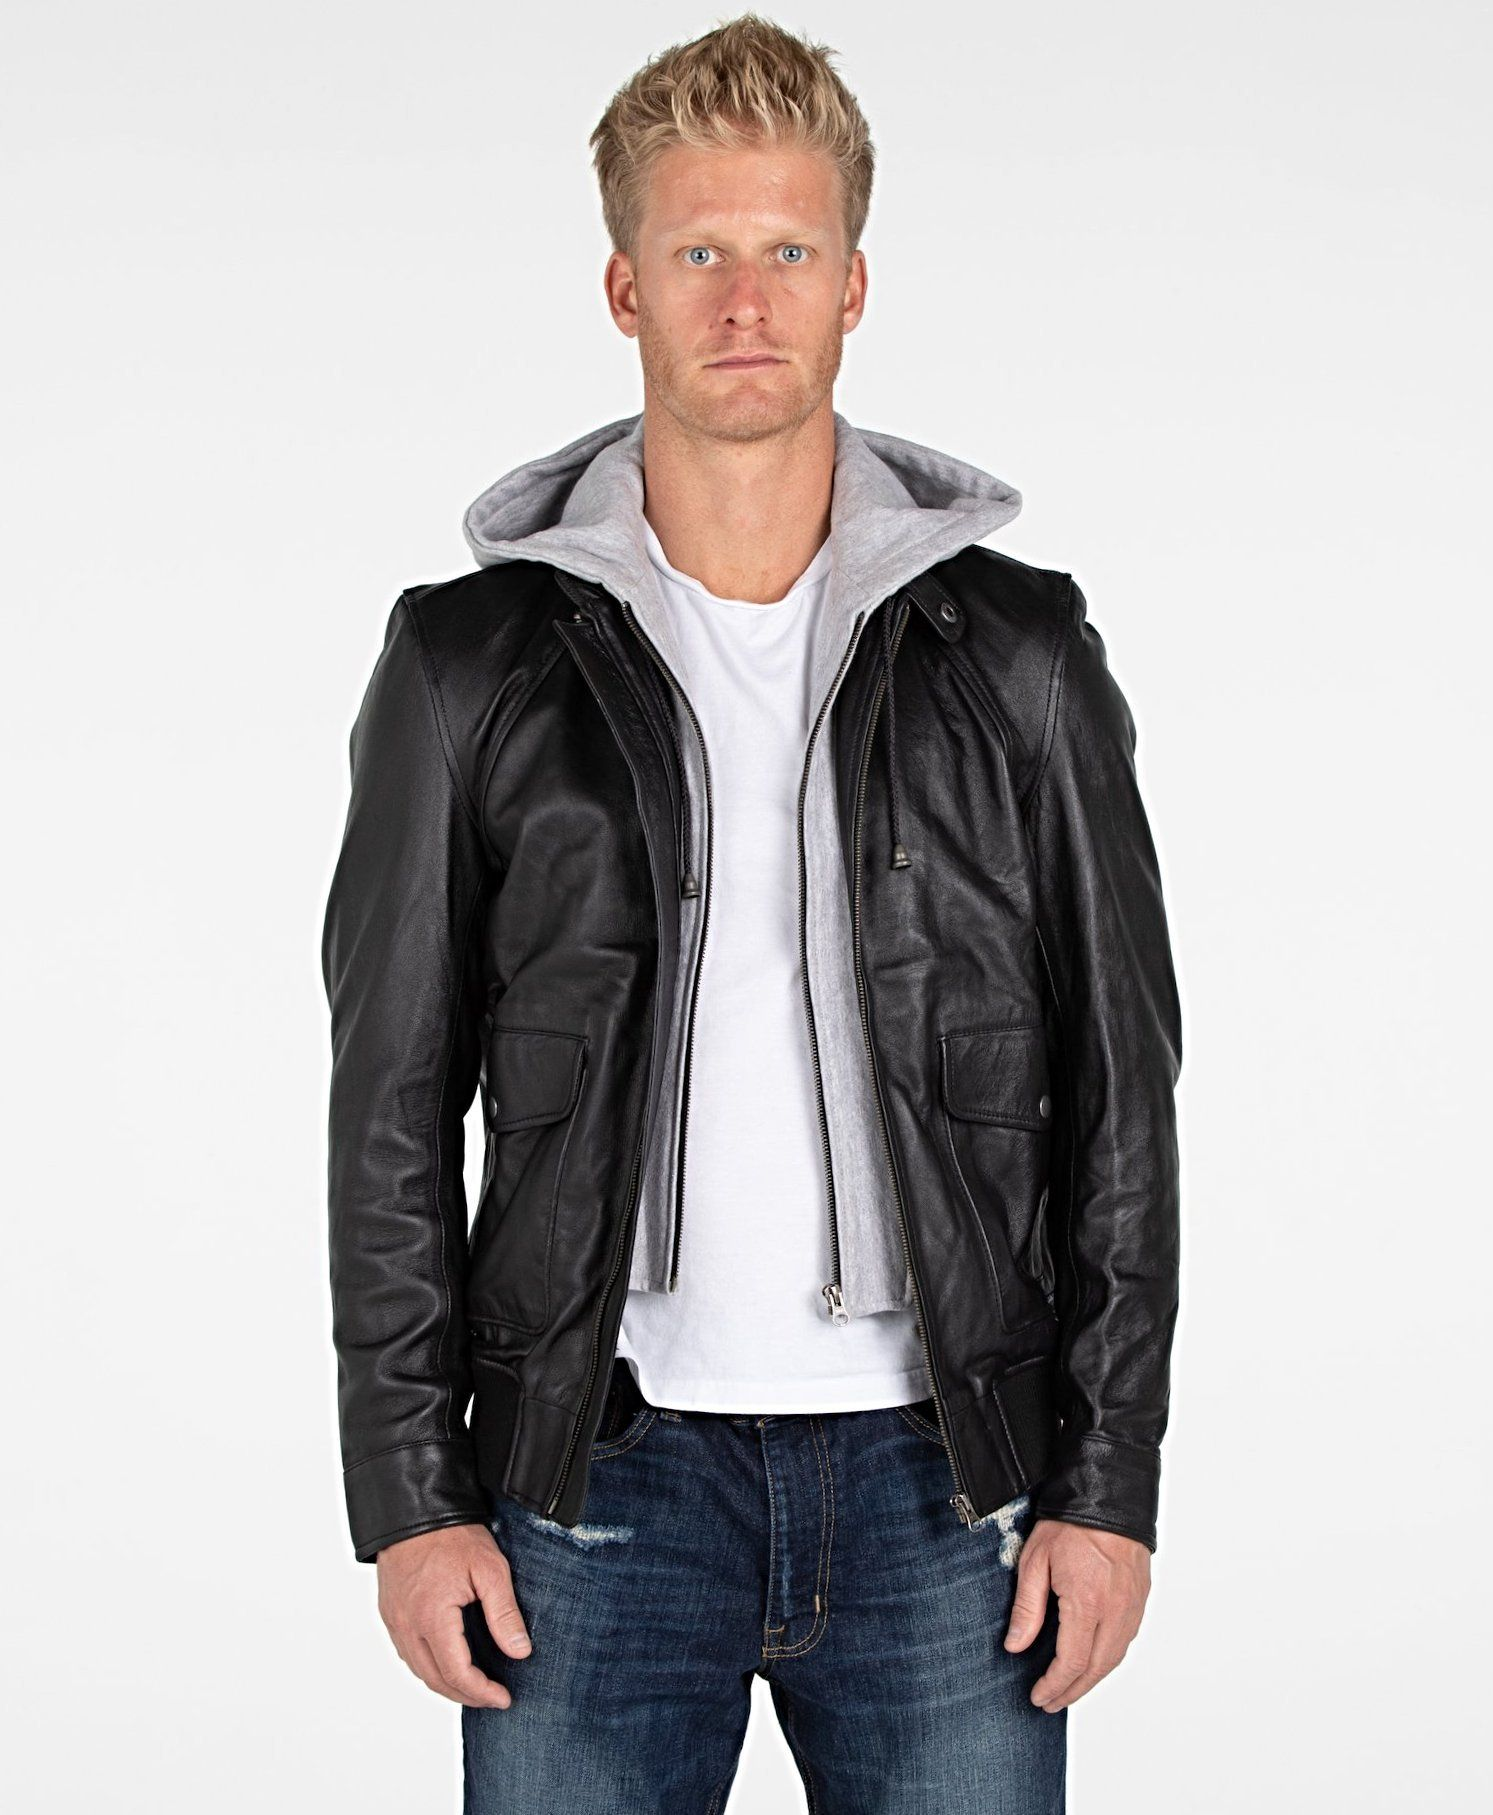 Men S Lambskin Hooded Leather Bomber Jacket Hooded Bomber Jacket Leather Jacket With Hood Leather Bomber Jacket [ 1815 x 1493 Pixel ]